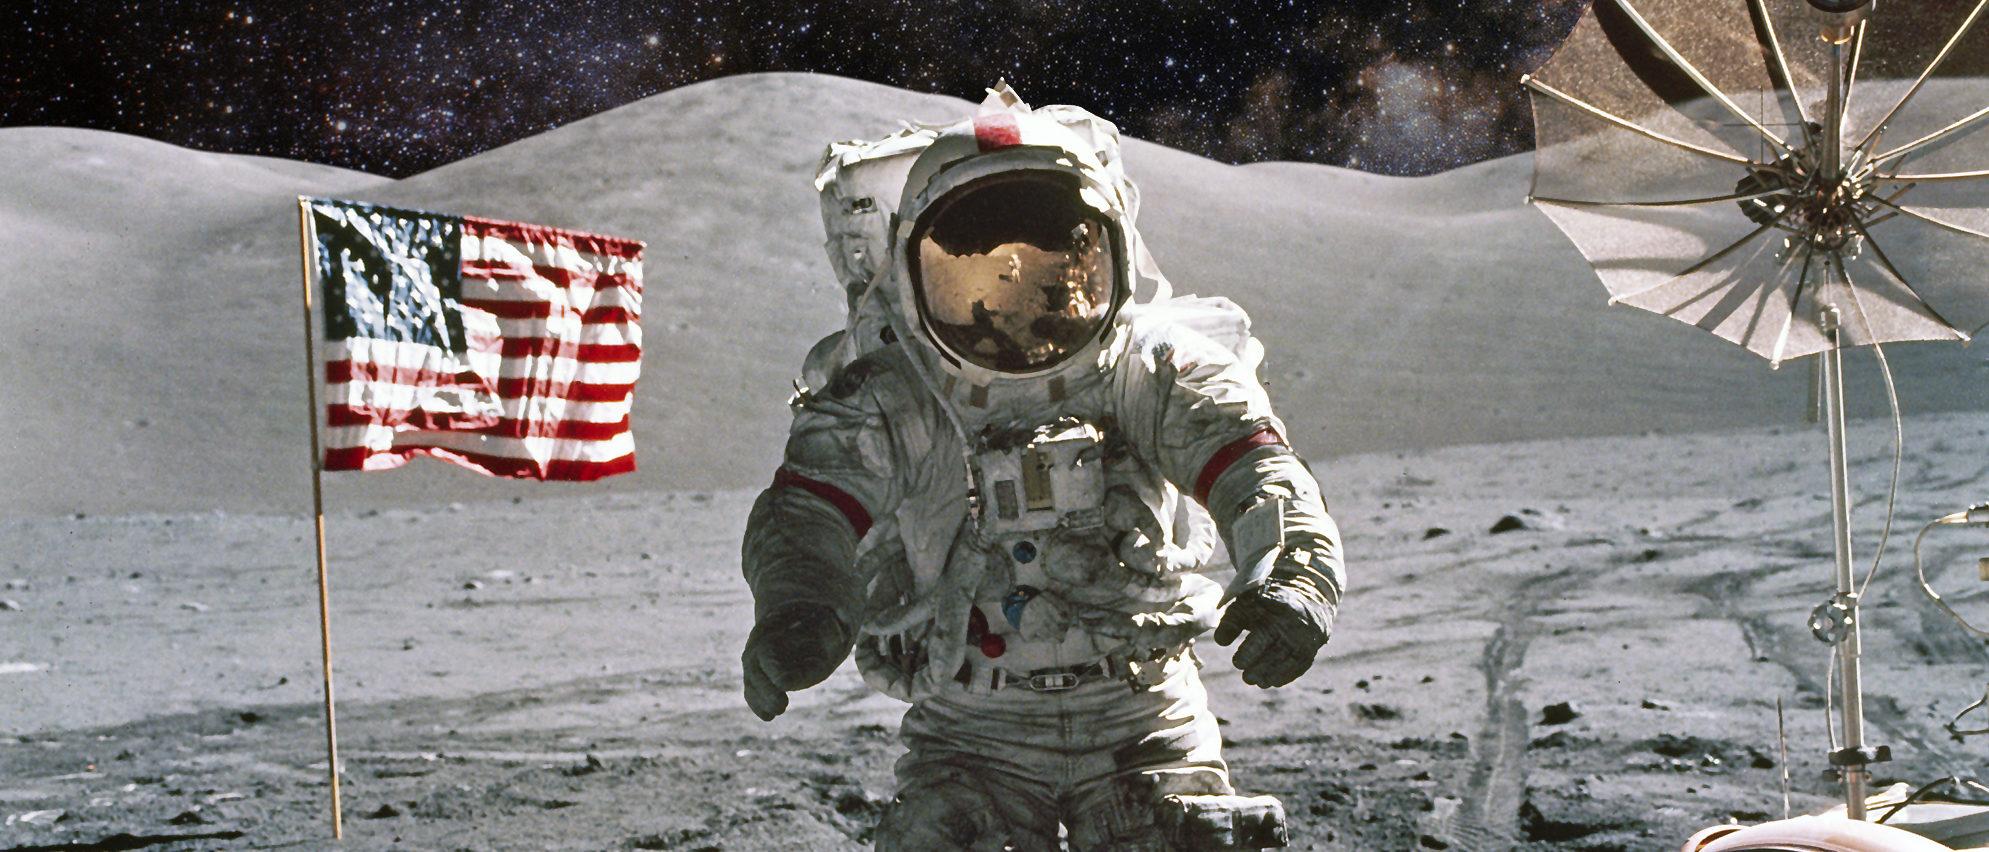 Astronaut on lunar (moon) landing mission. (Shutterstock/Castleski)